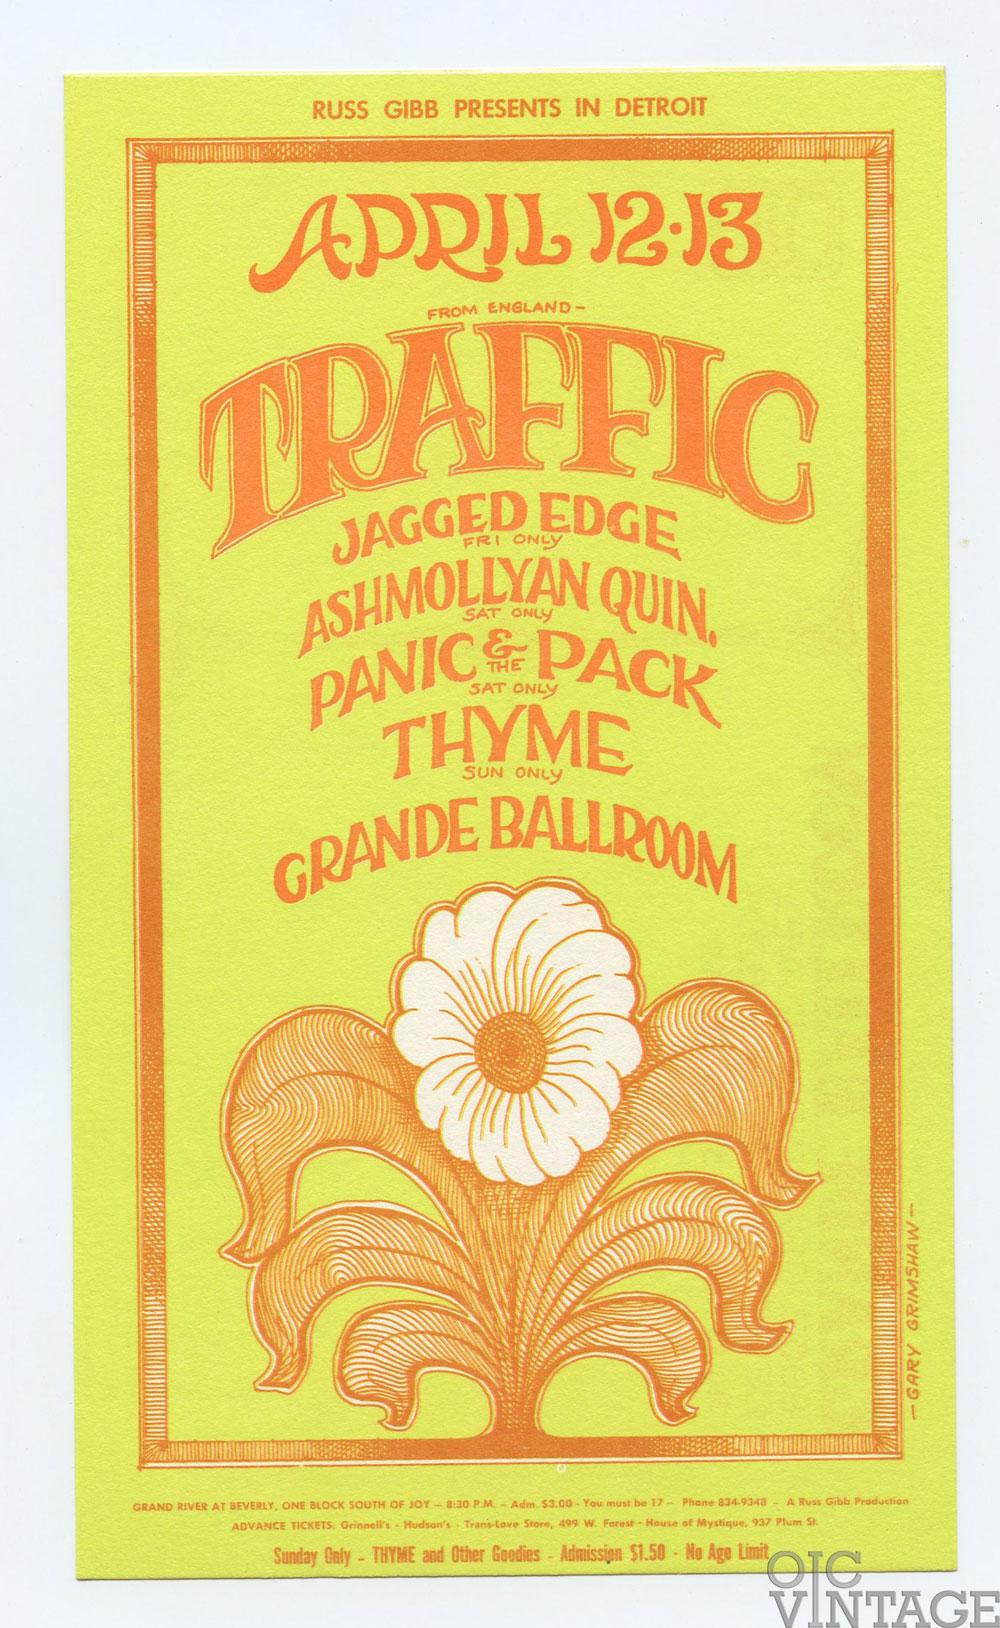 Grande Ballroom Postcard 1968 Apr 12 Traffic Jagged Edge Ashmollyan Quintet